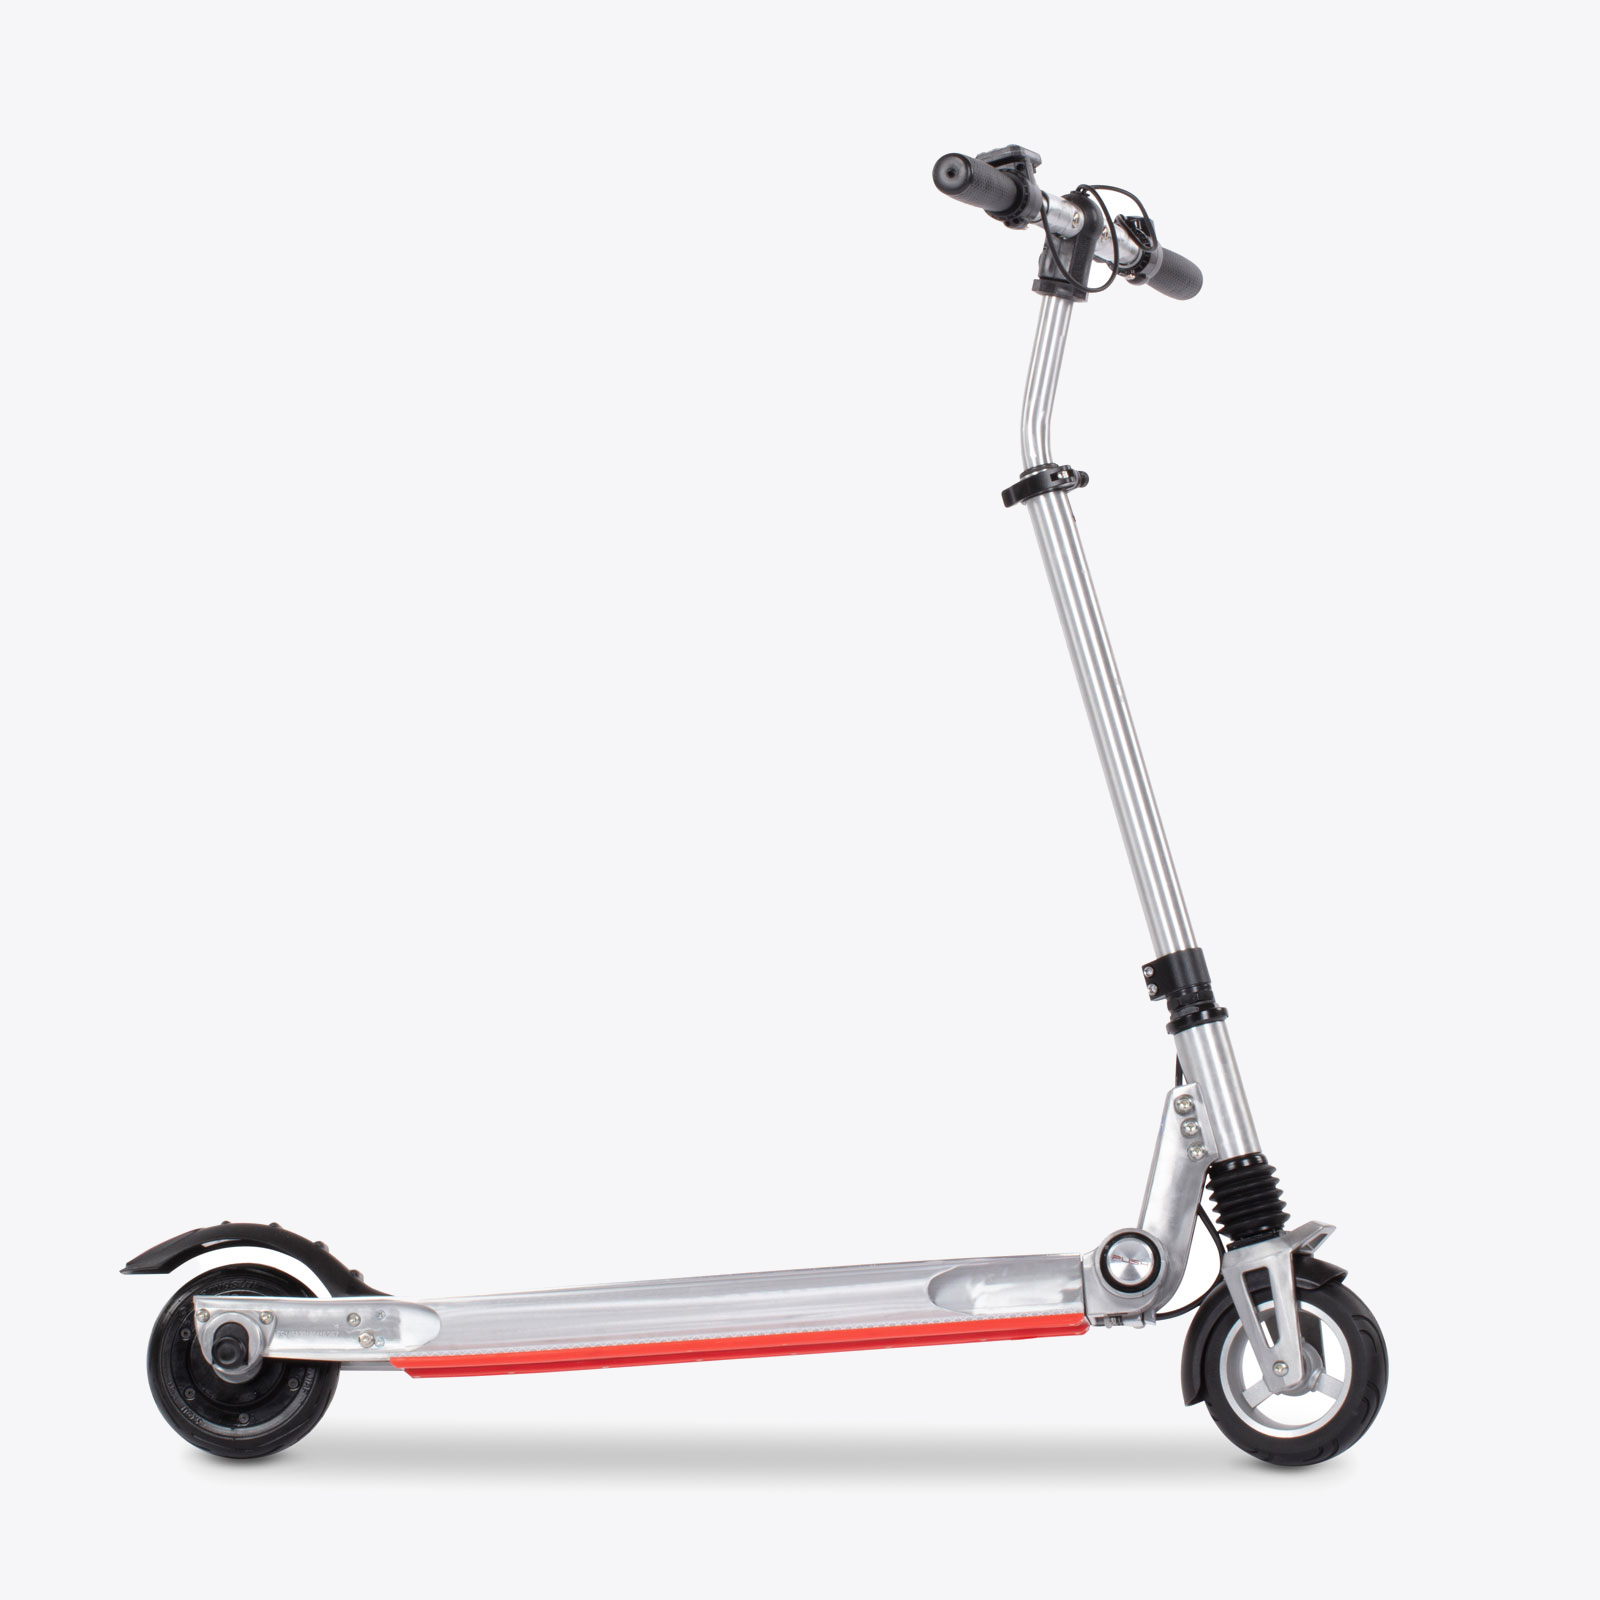 moovi-escooter-silber-seite